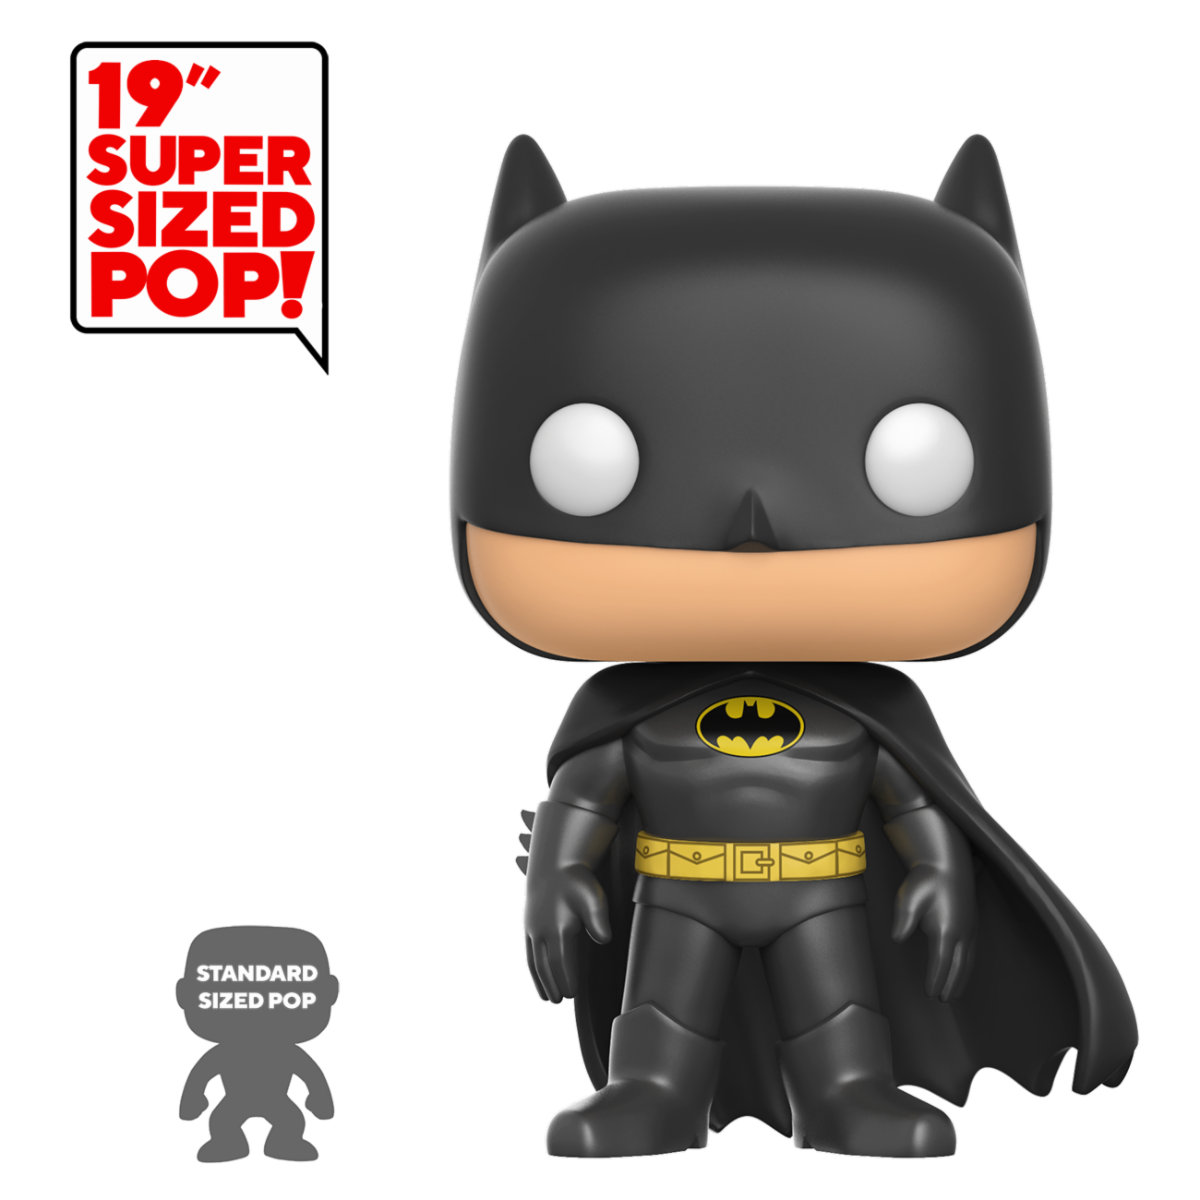 Diverdeimentoko Super  dimensioni pop 19  BATuomo PREORDER GENNAIO 2020  vendita di offerte